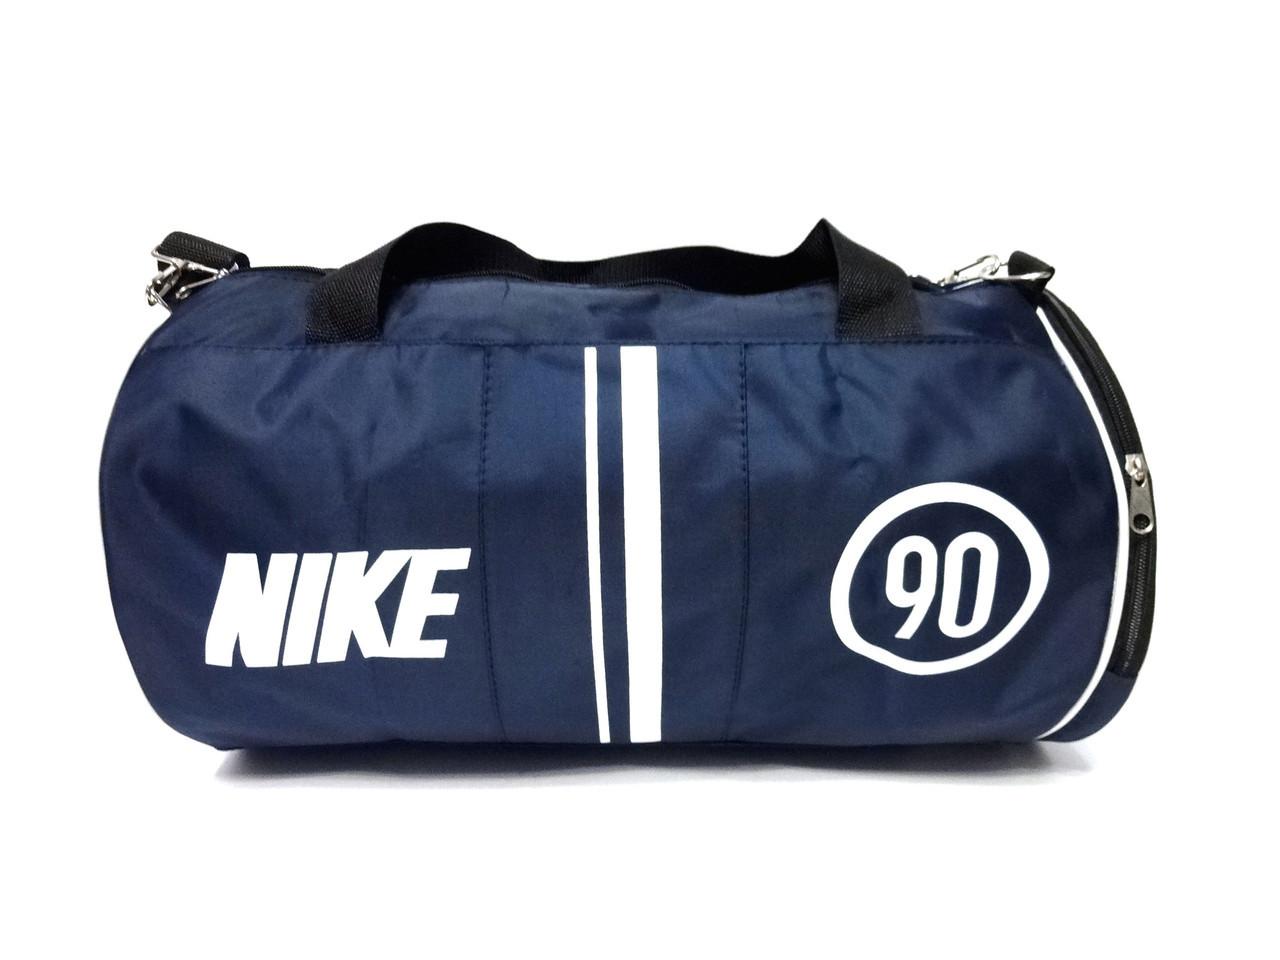 2fc3d86aaff0 Темно синяя спортивная сумка Nike 90, цилиндр туба — купить в ...